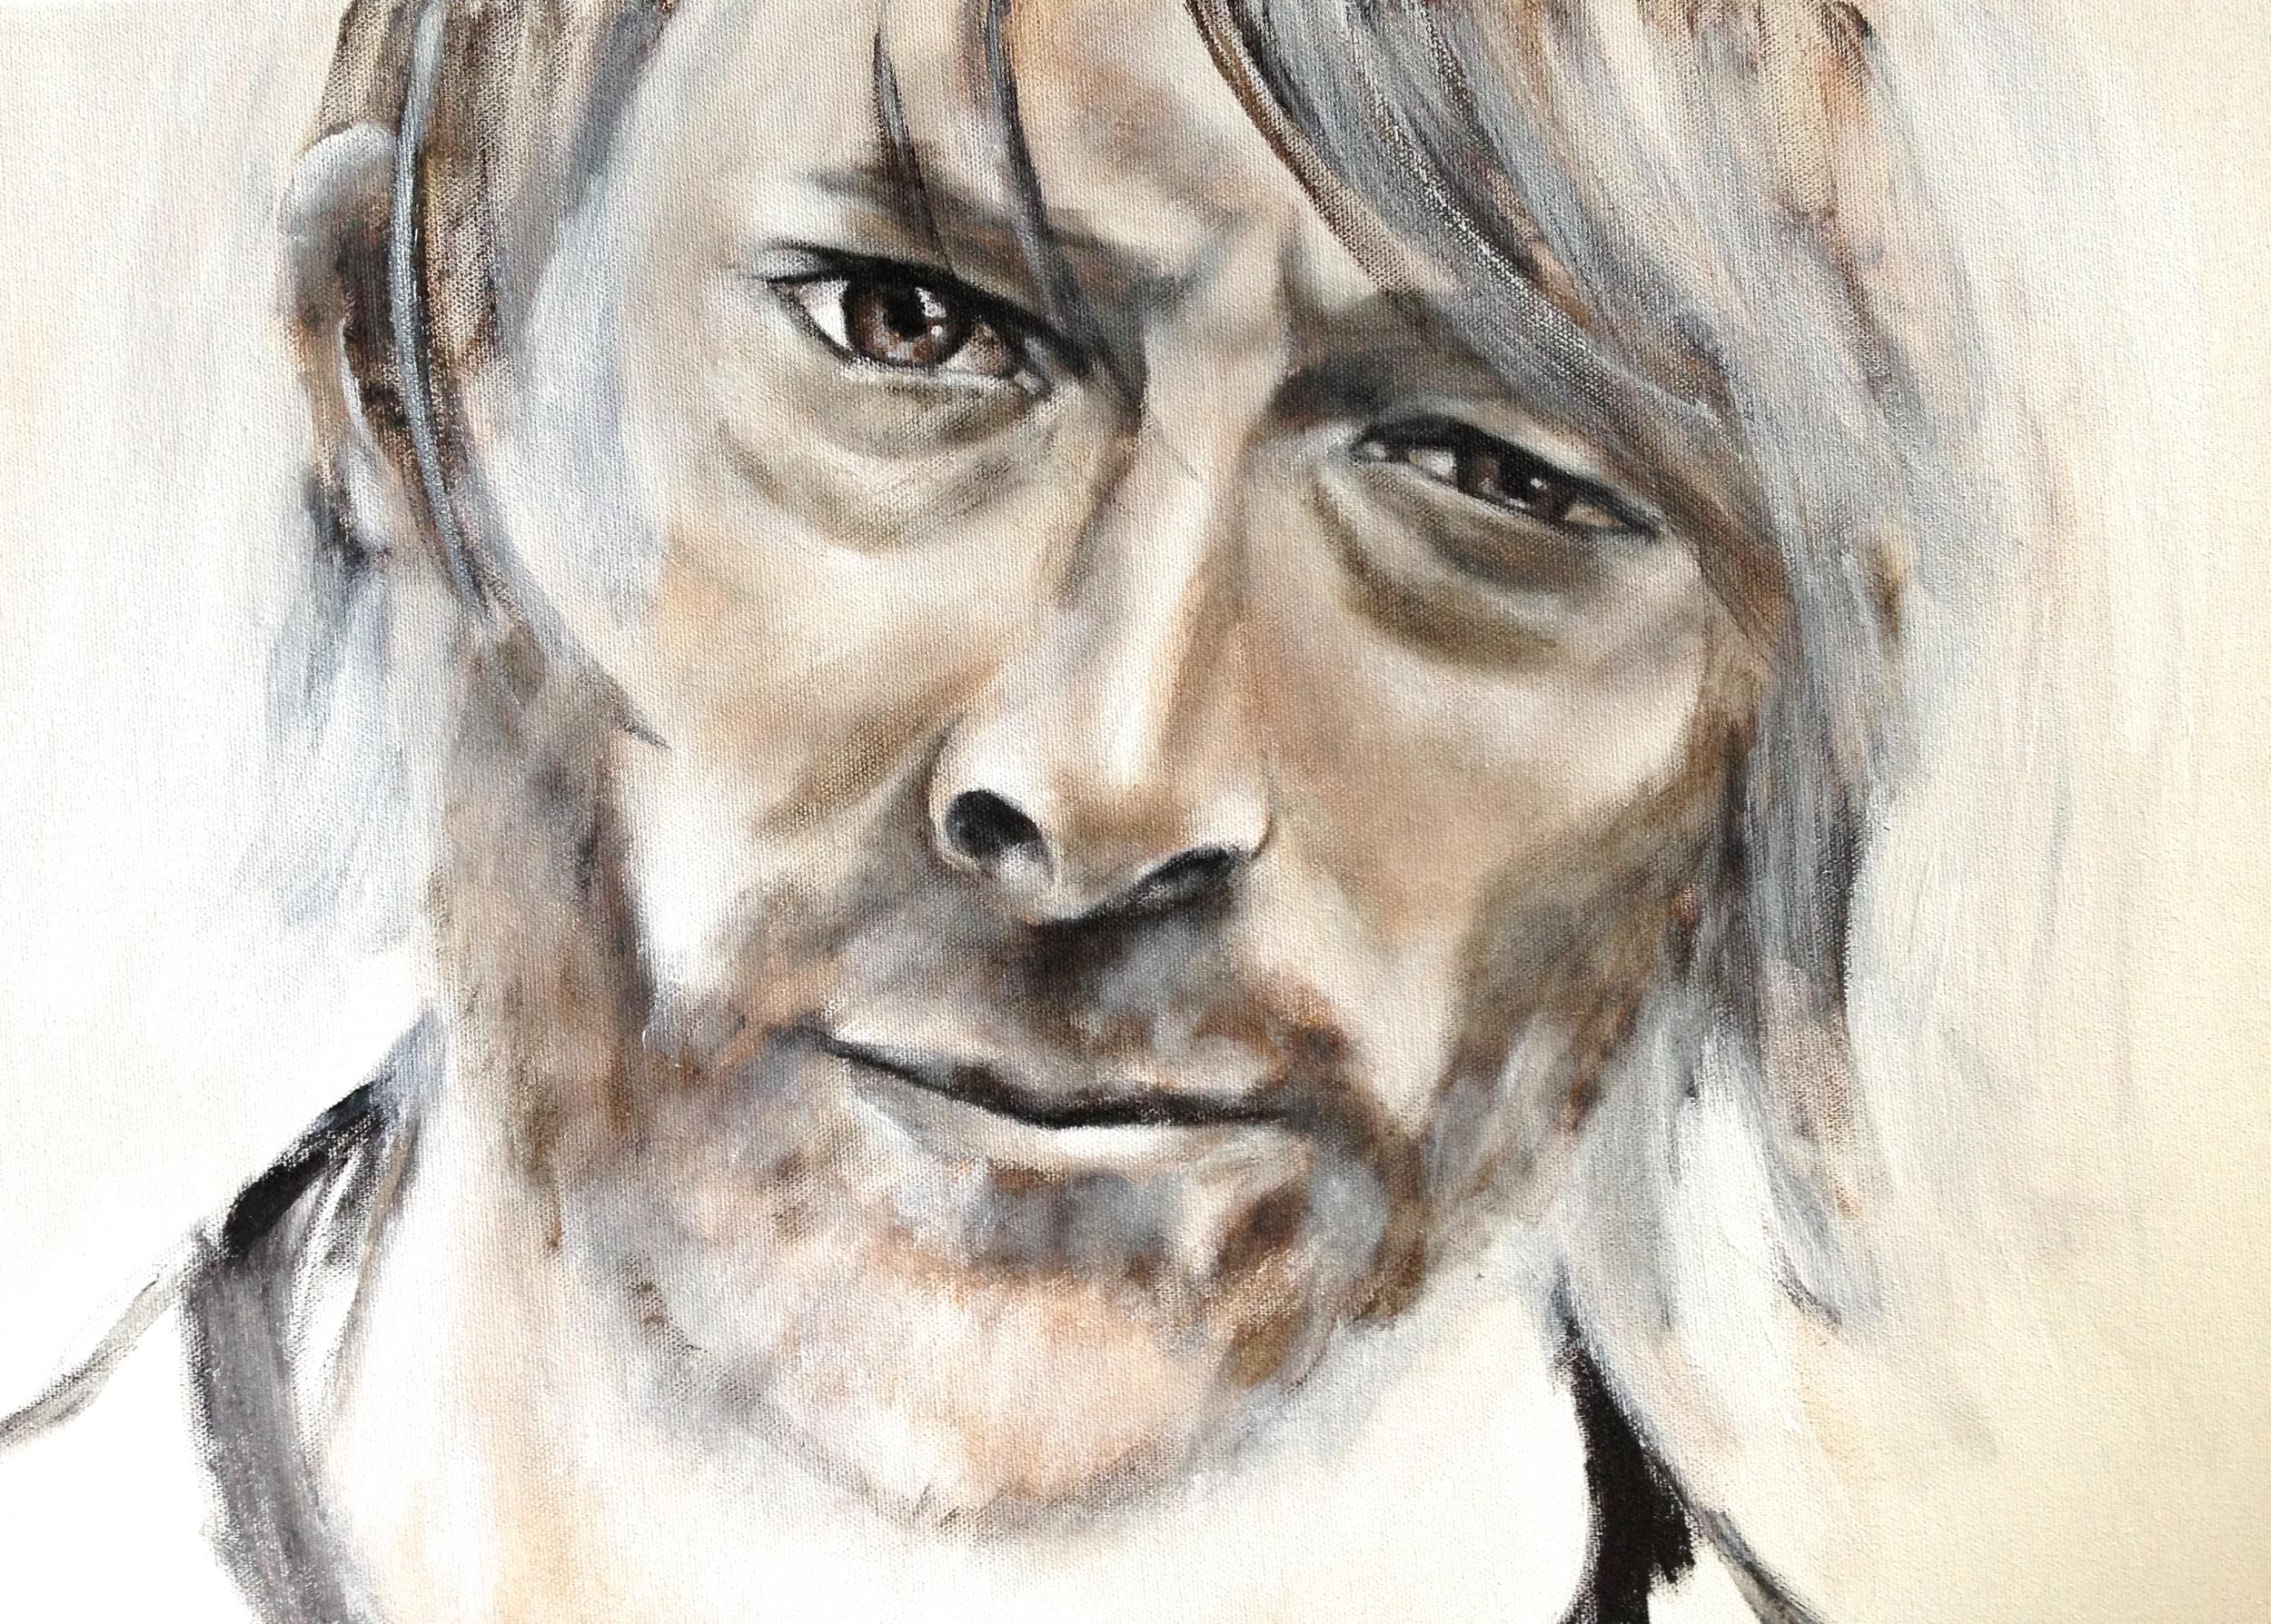 Thom York, never finished, 2015   Acrylic on canvas